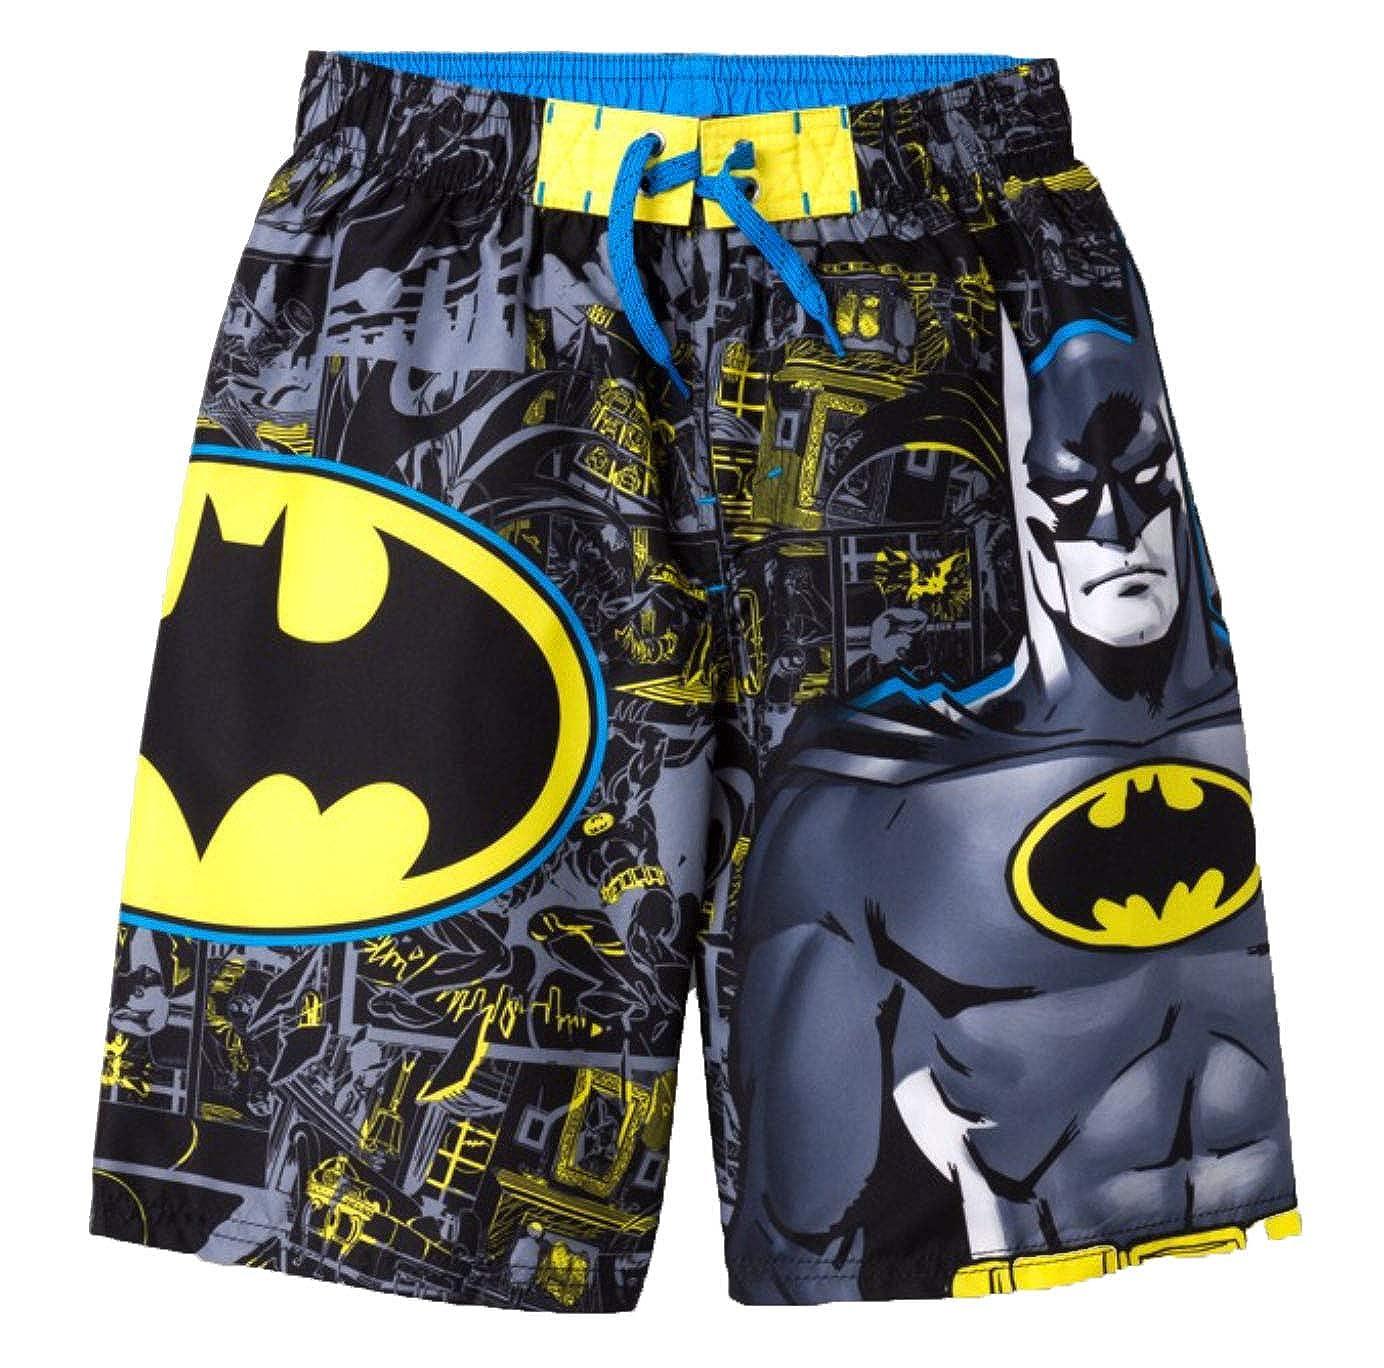 Dreamwear Boys Batman Swim Trunks XSmall Black